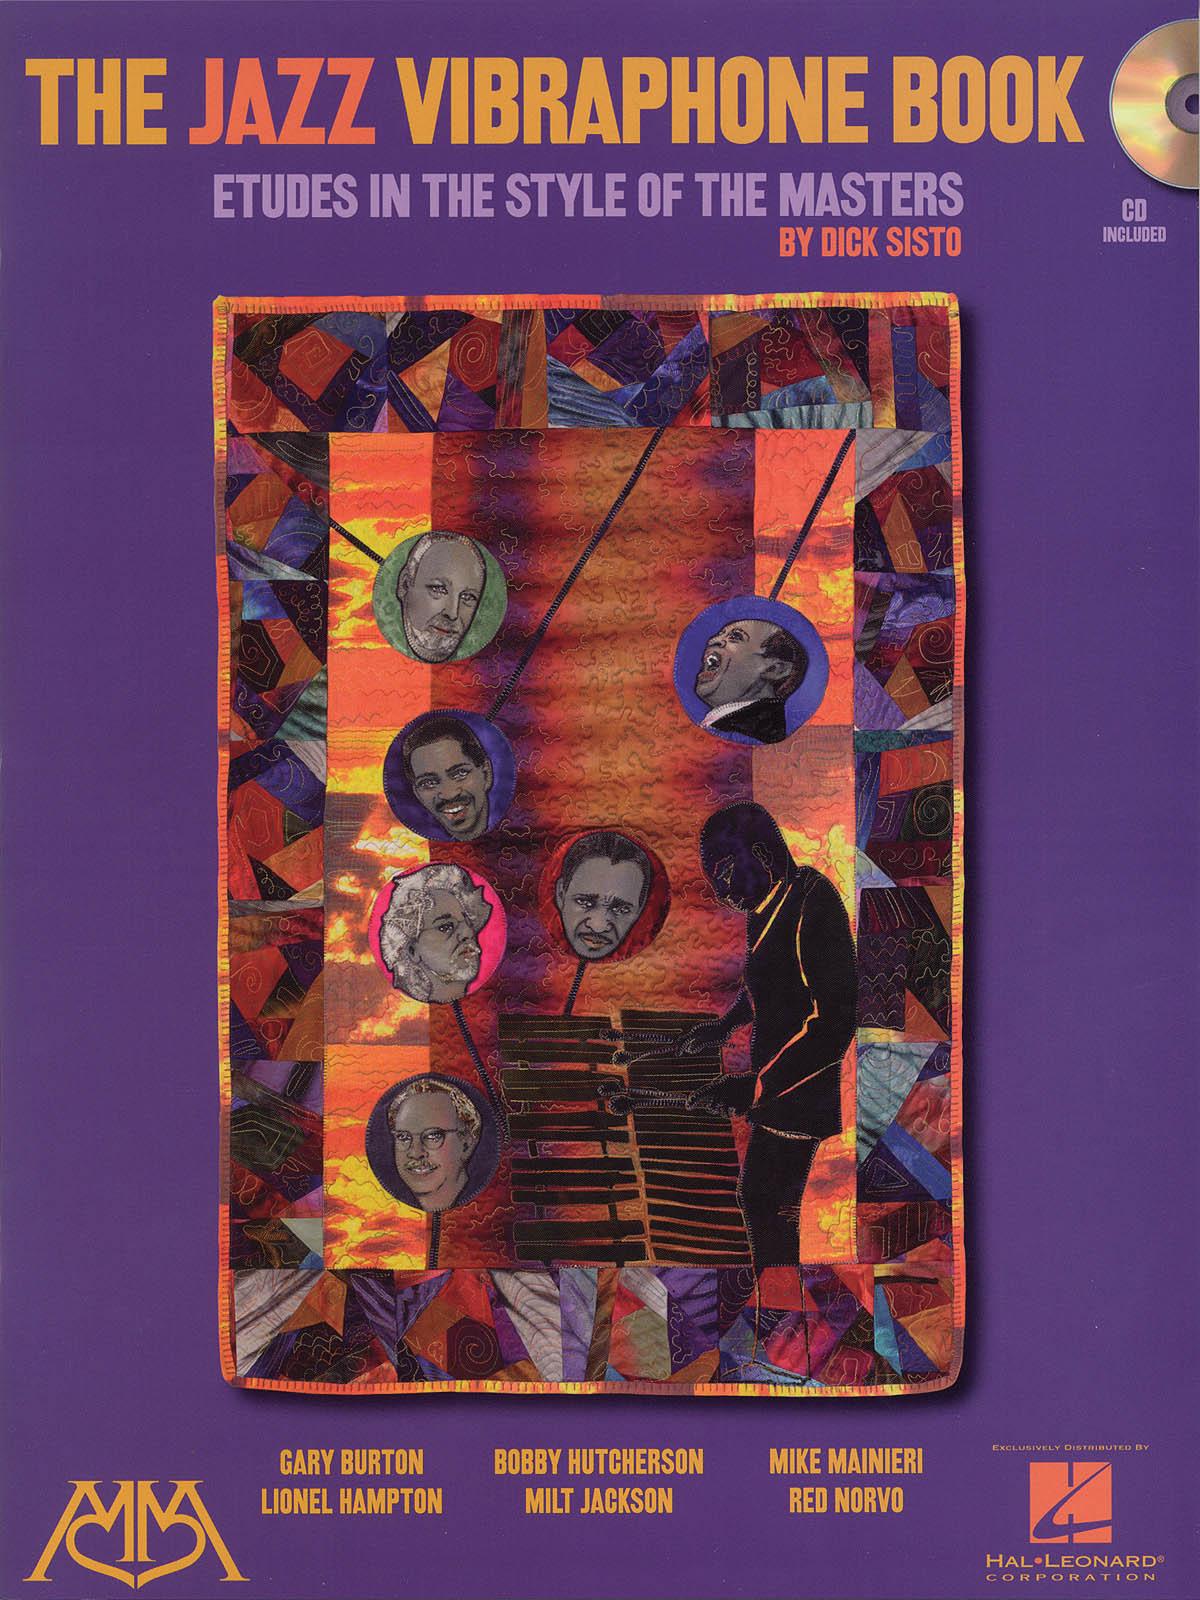 The Jazz Vibraphone Book: Vibraphone: Instrumental Album